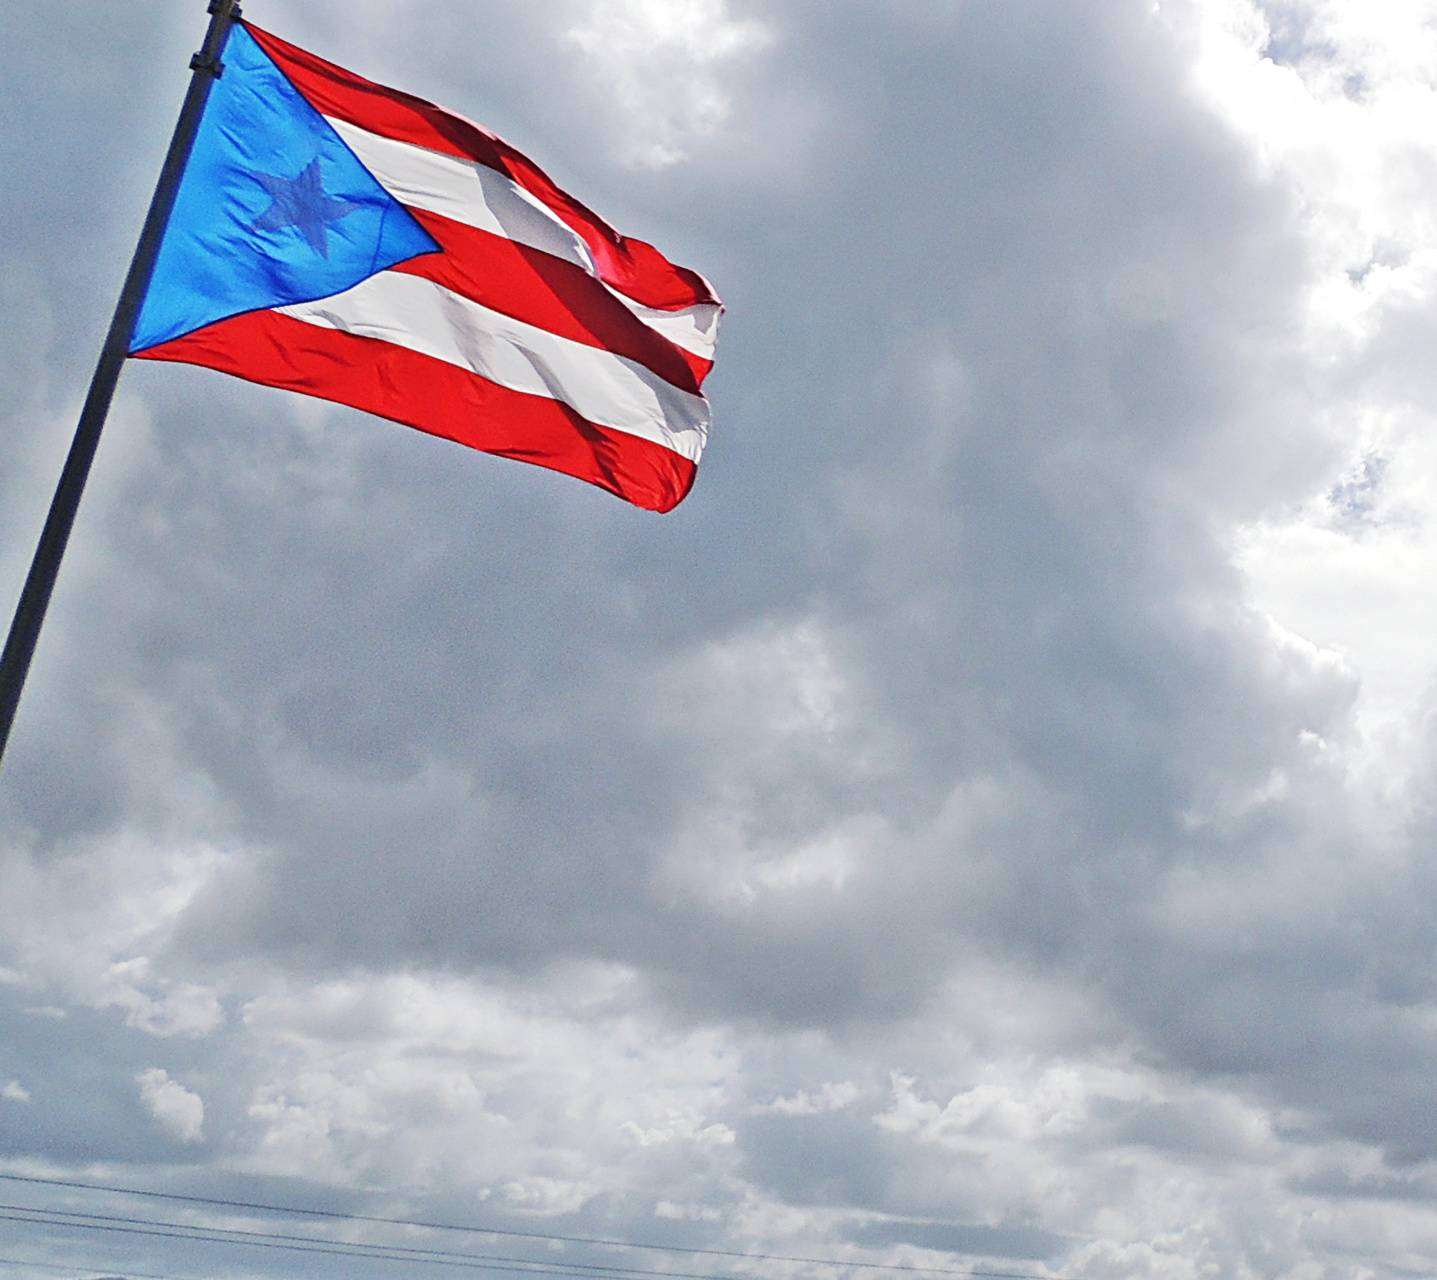 Puerto Rico Wallpaper By Rickybernard 64 Free On Zedge